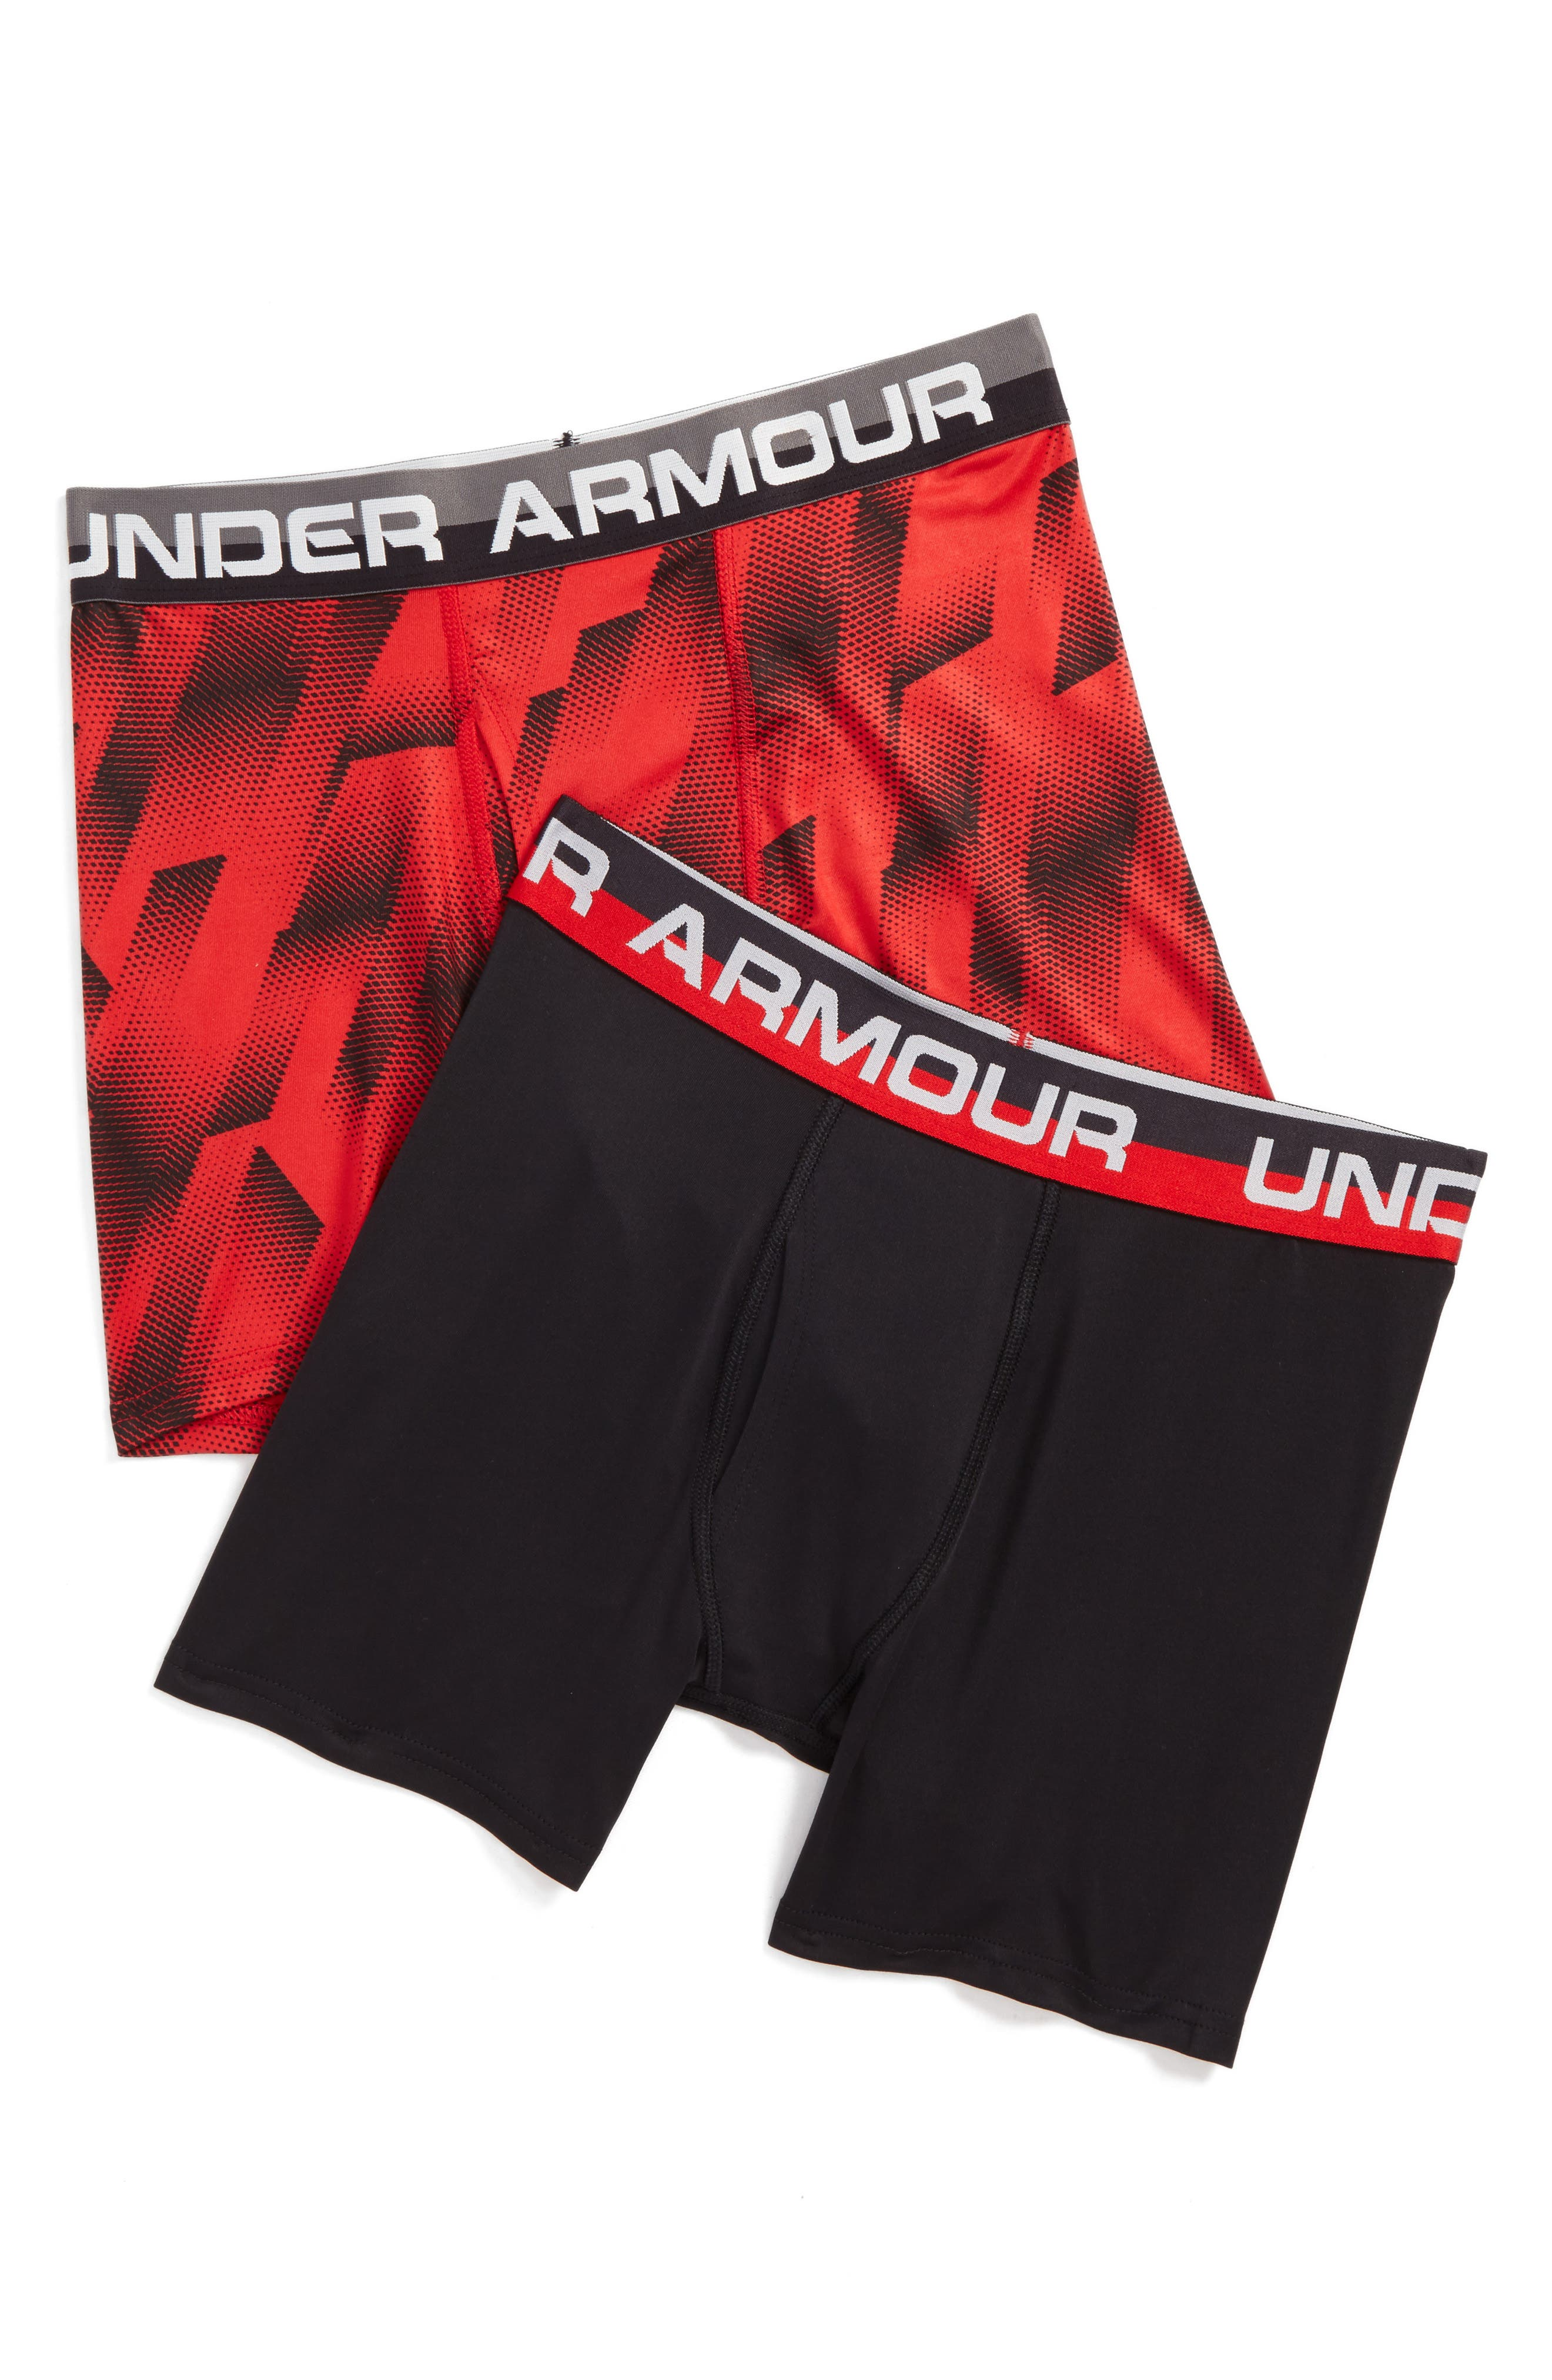 Sandstorm 2-Pack Boxerjock<sup>™</sup> Boxer Briefs,                         Main,                         color, Red